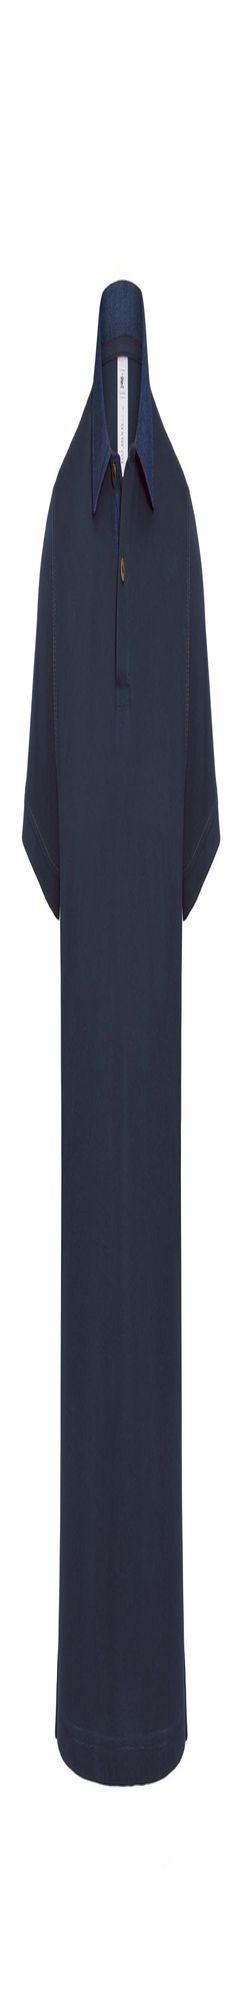 Рубашка поло мужская DNM Forward темно-синяя фото